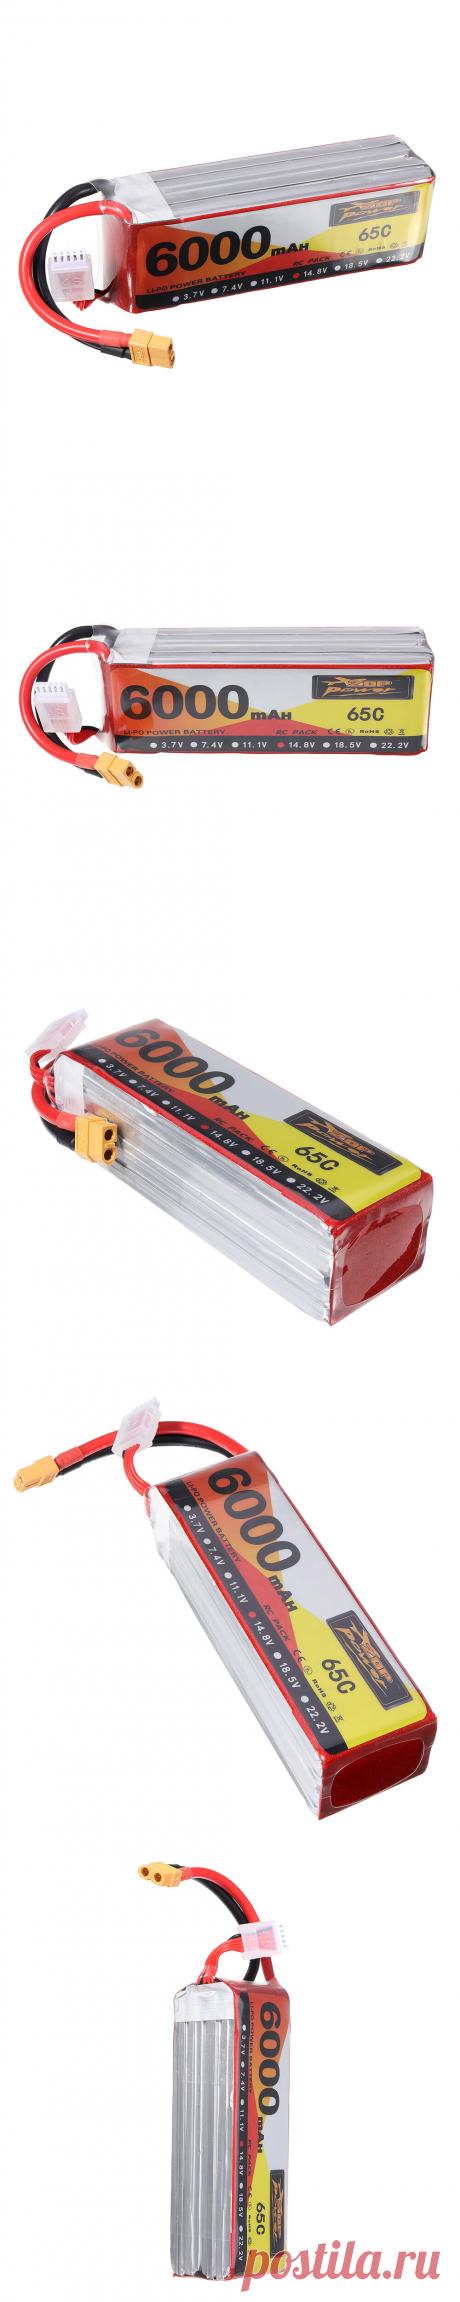 zop power 14.8v 6000mah 65c 4s lipo battery xt60 plug for rc drone Sale - Banggood.com